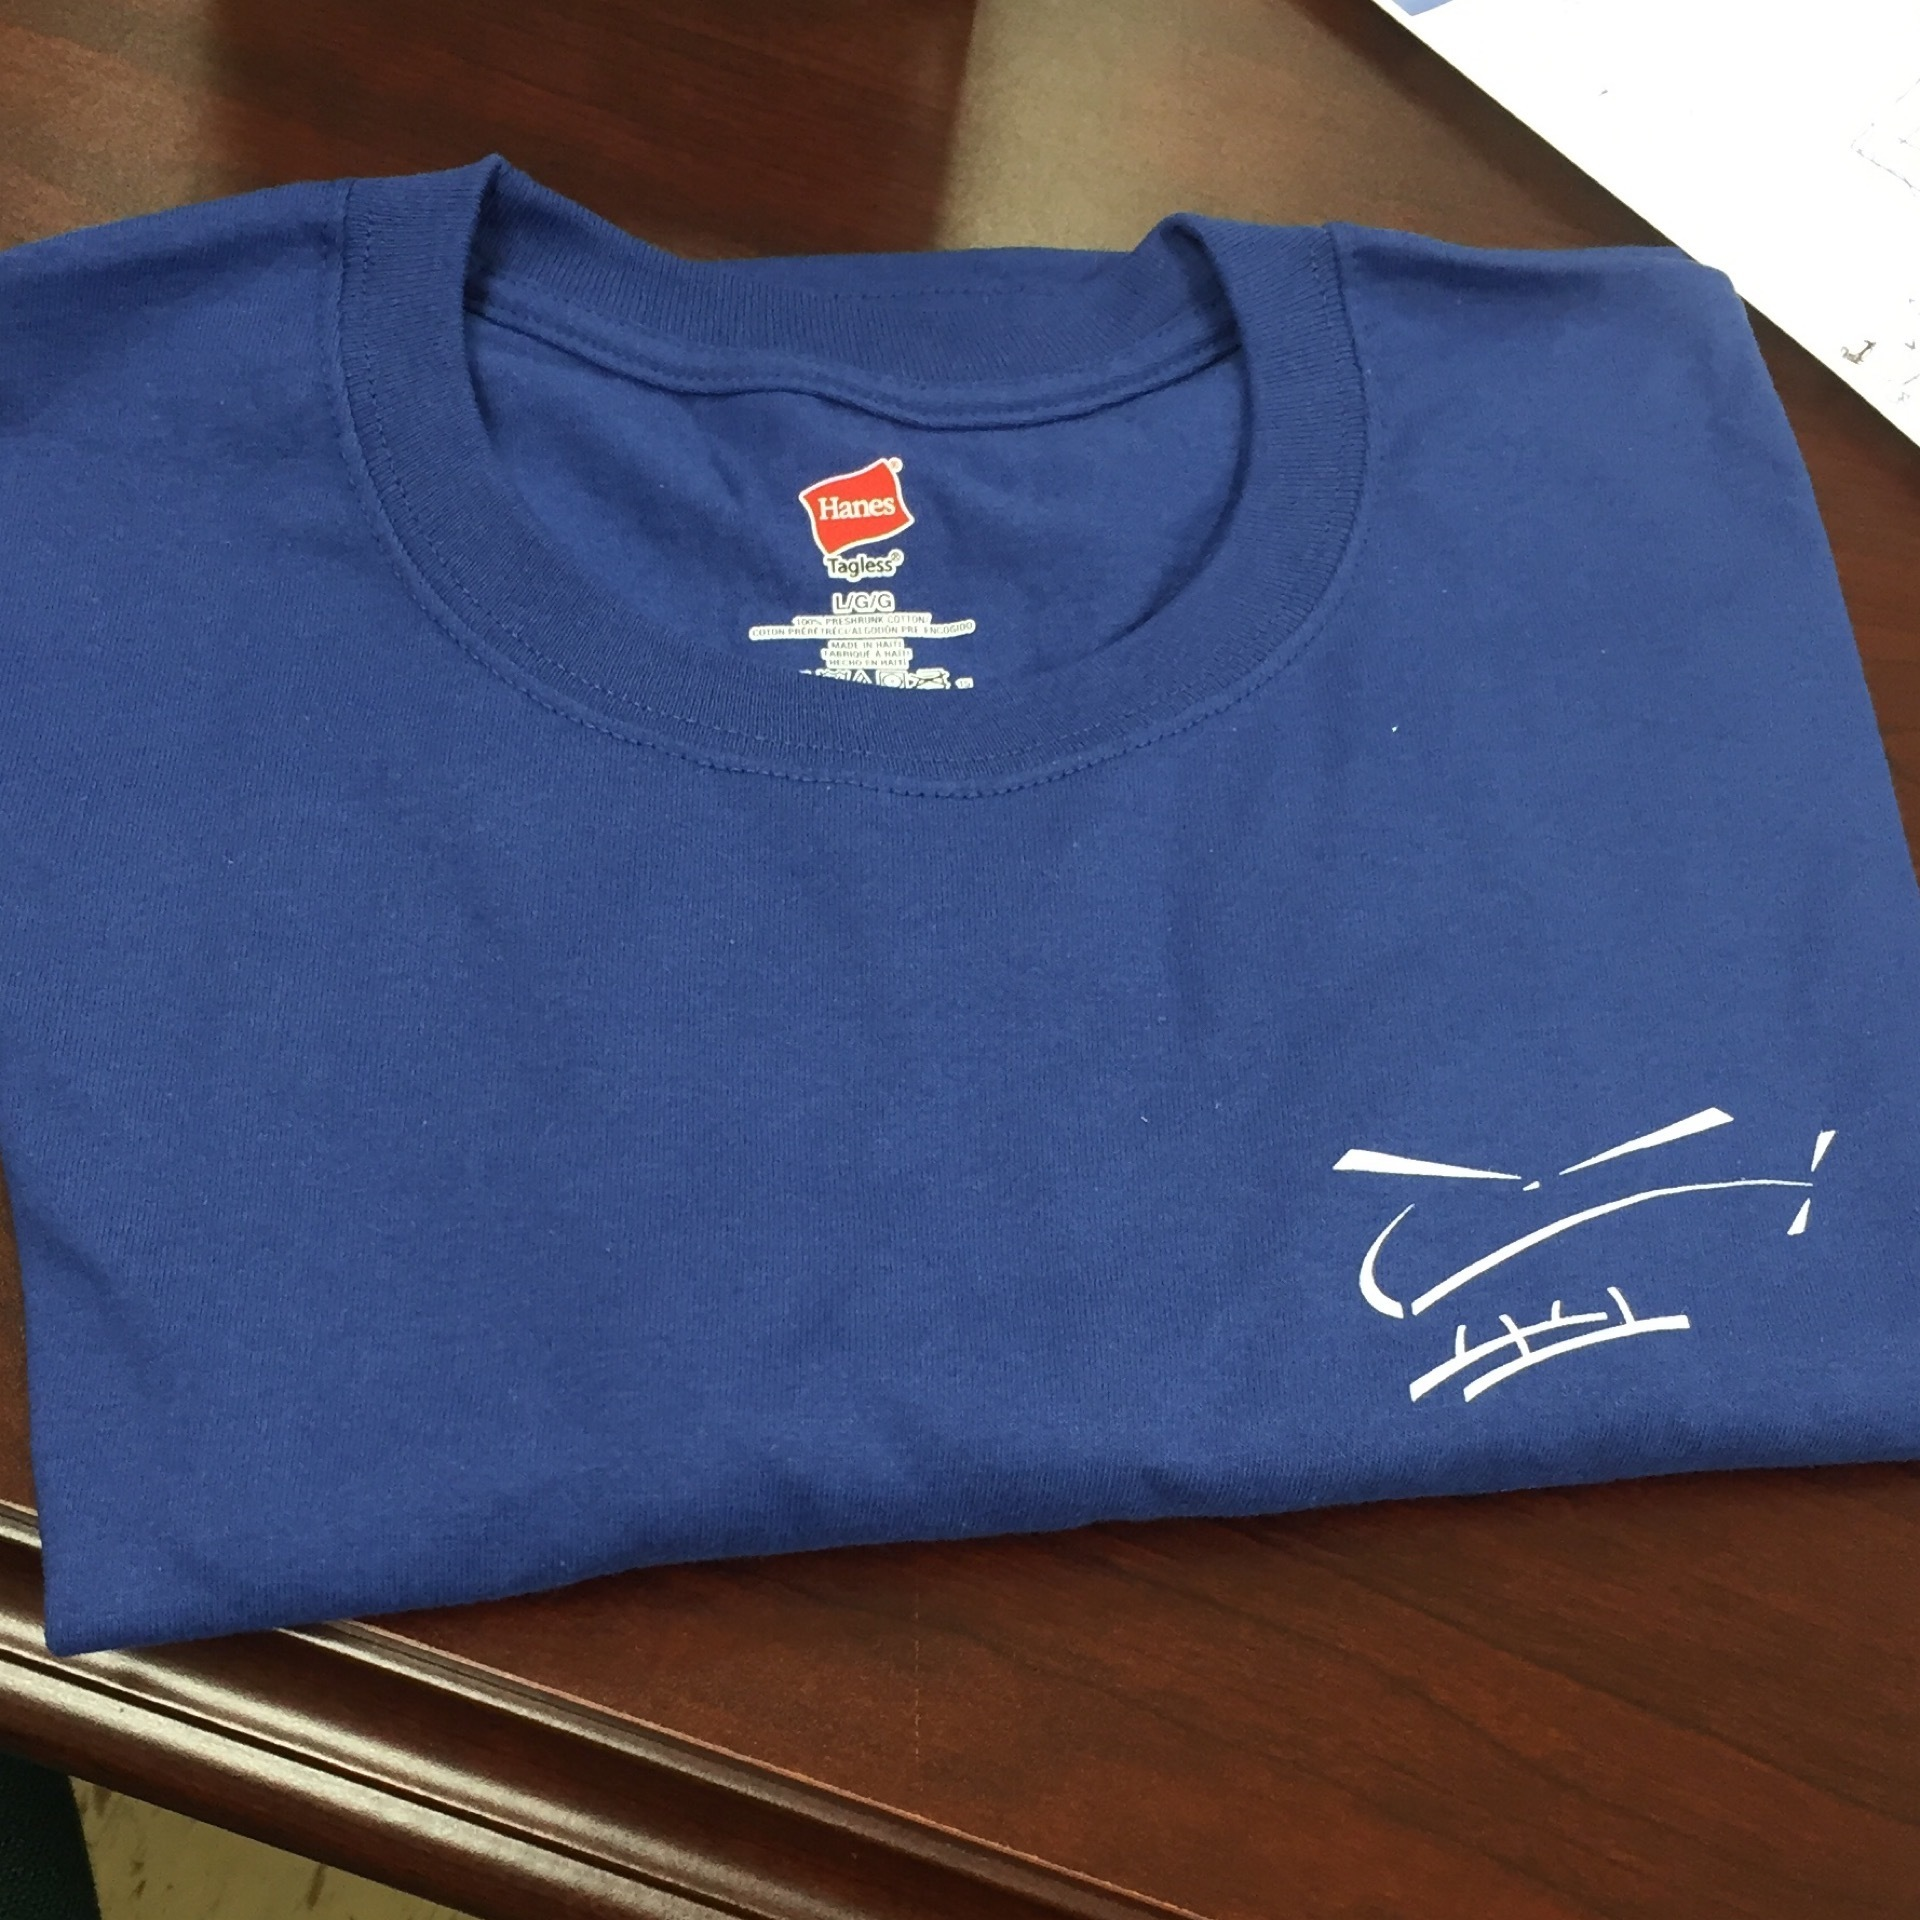 Shirts 5BEDC352-6BCA-41FC-9AE9-DB3A132B02B8